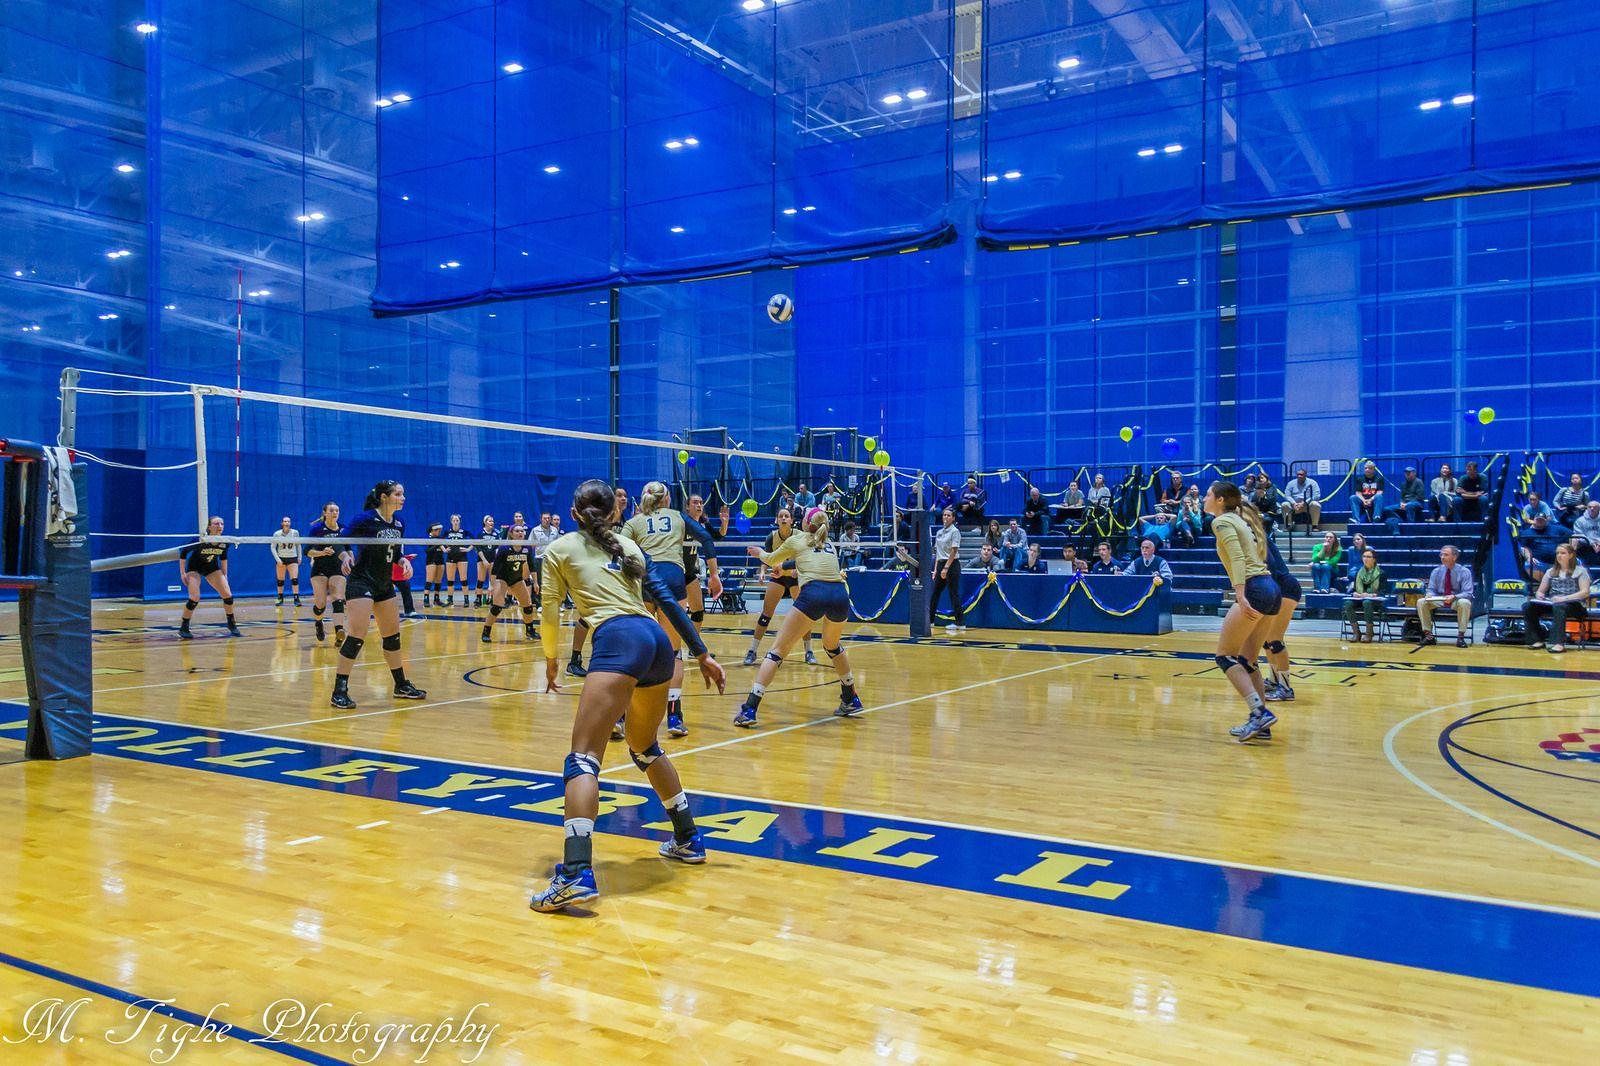 Navy Vollyball Navy Volleyball Naval Academy